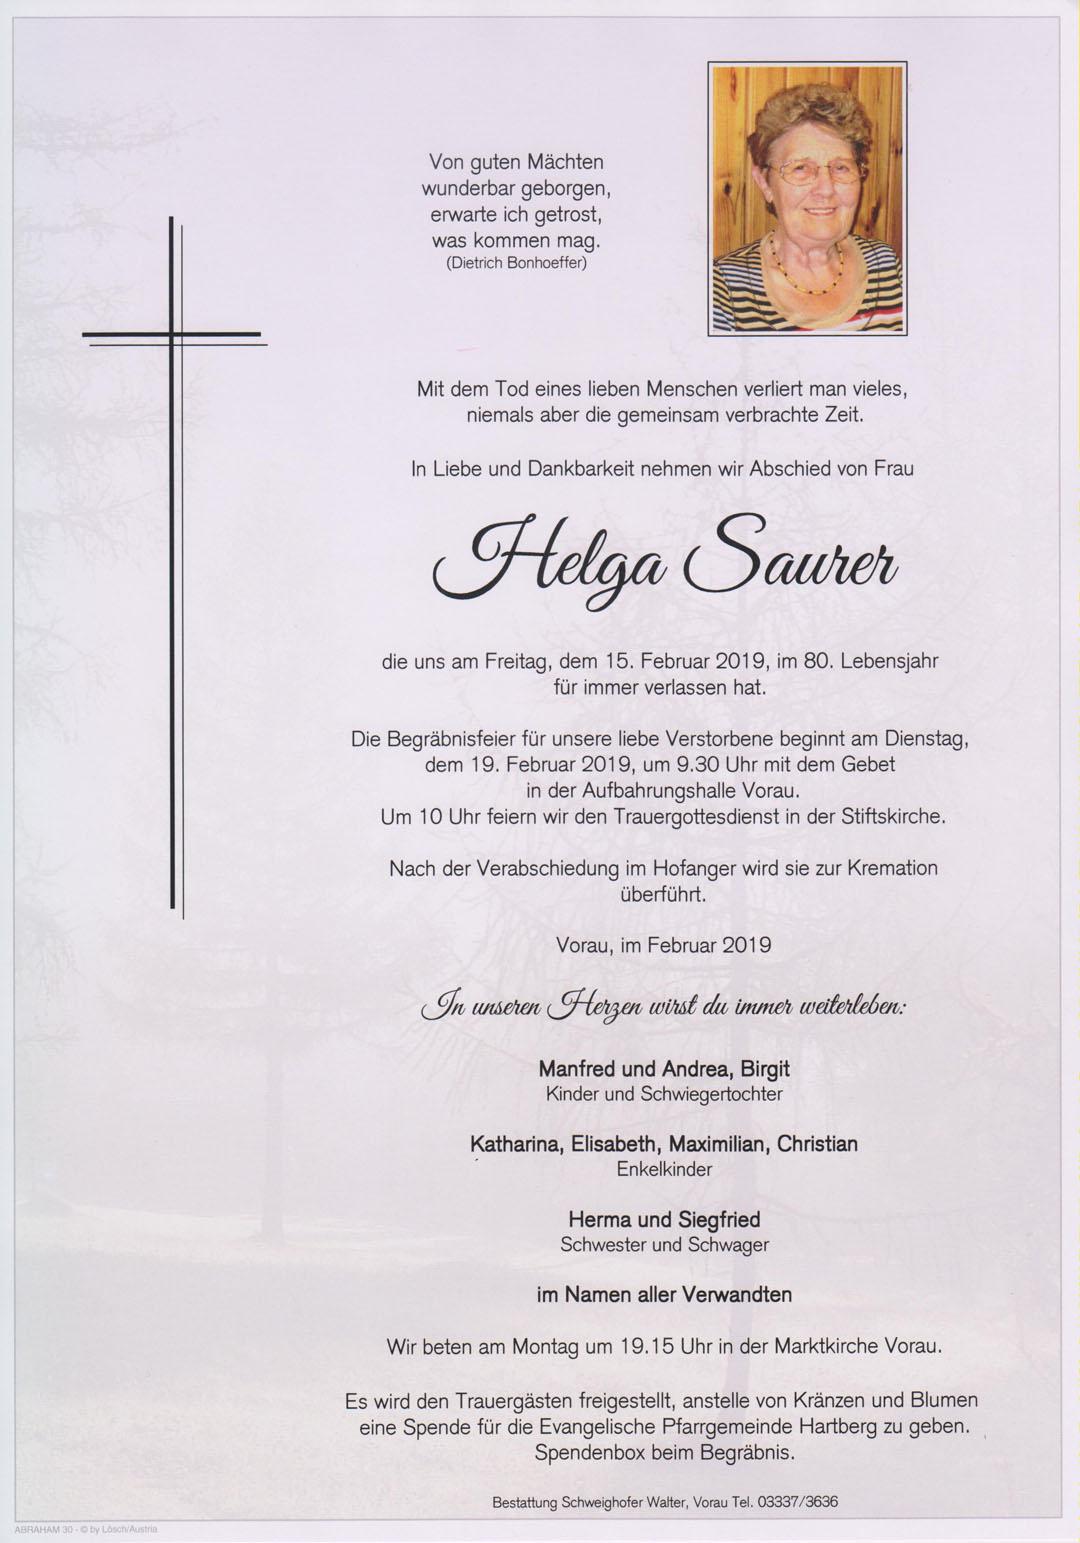 Helga Saurer